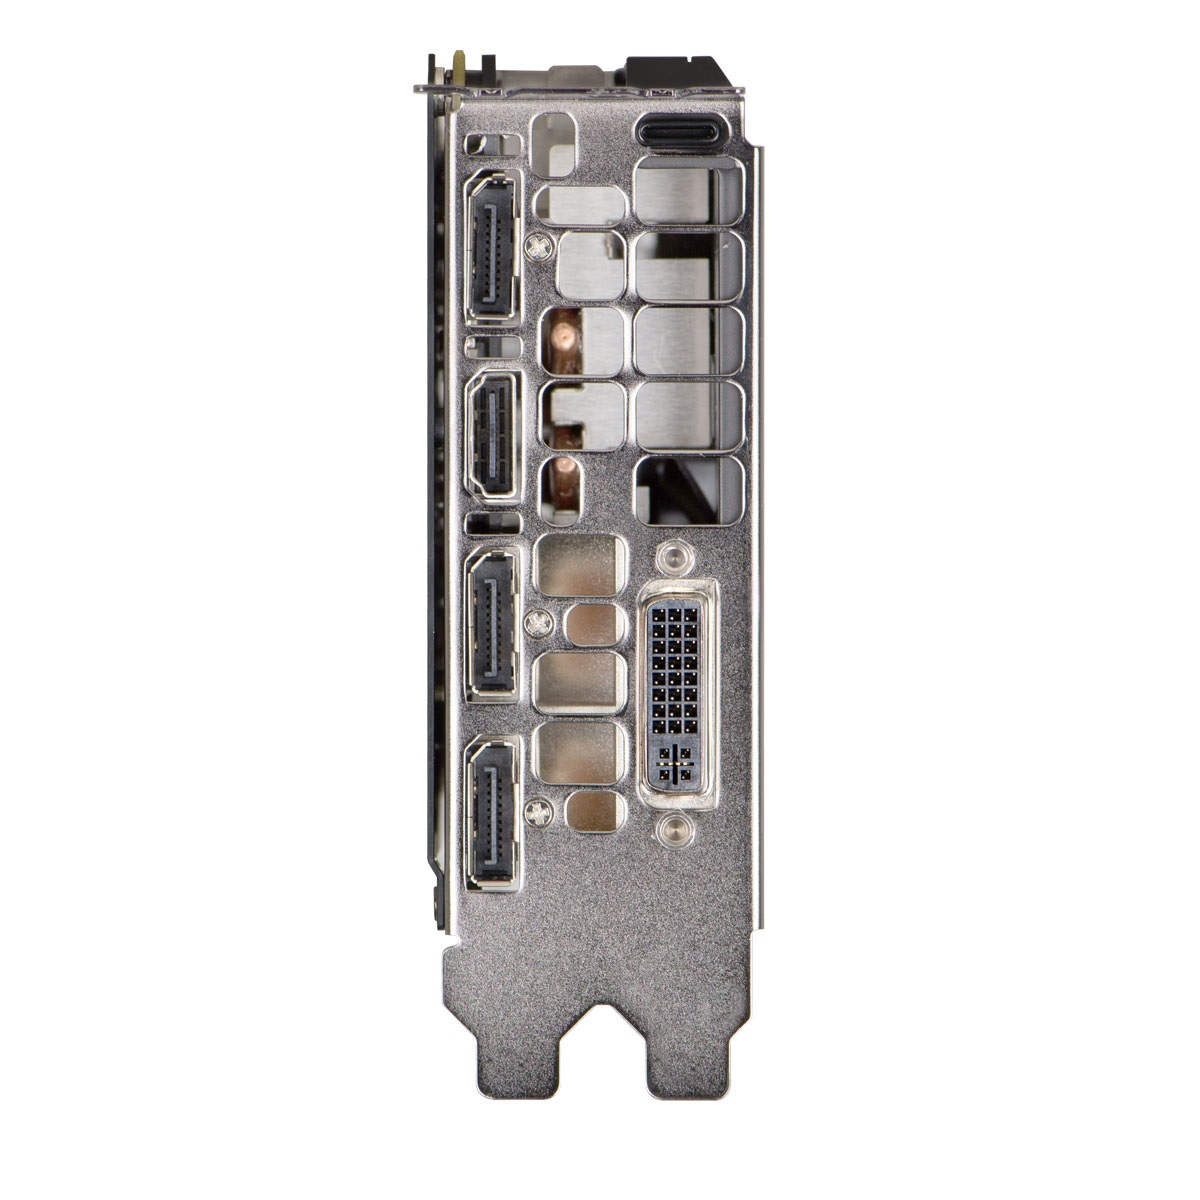 Placa de Vídeo Geforce GTX970 4GB SuperClock DDR5 256Bit 04G-P4-3975-KR - EVGA